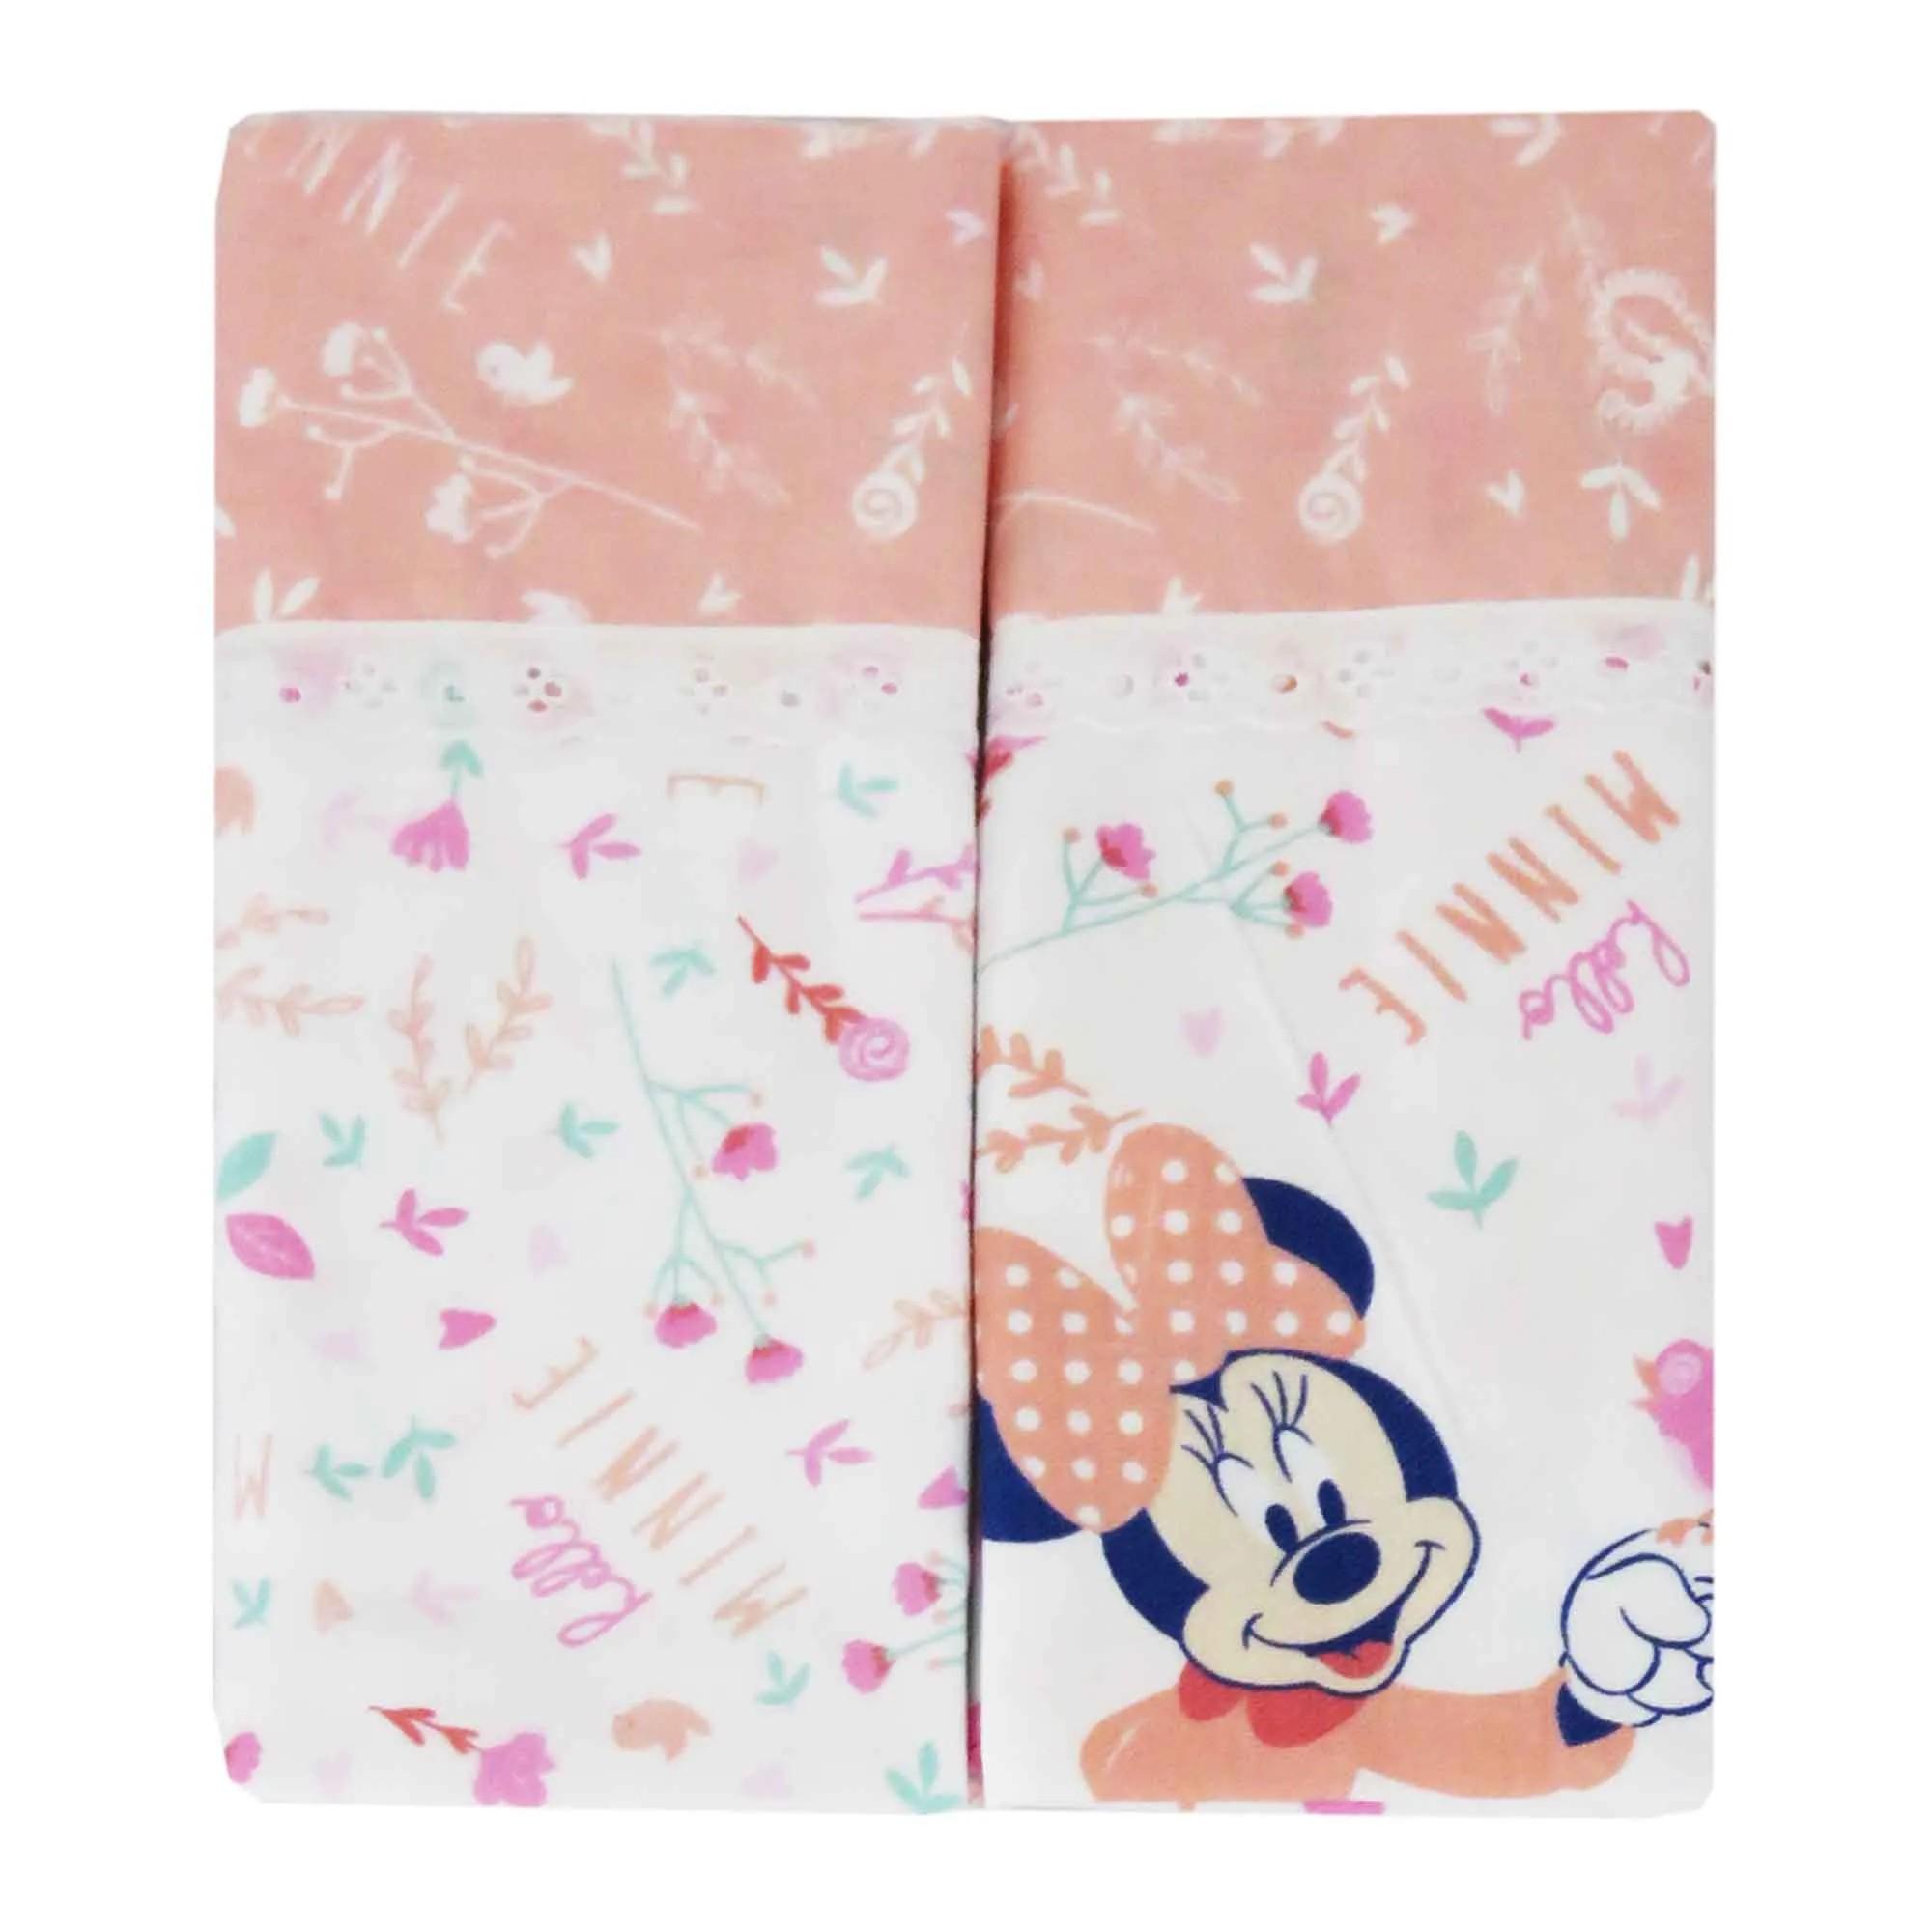 Kit Cueiro Minasrey Disney Duas Unidades Estampado - Minnie